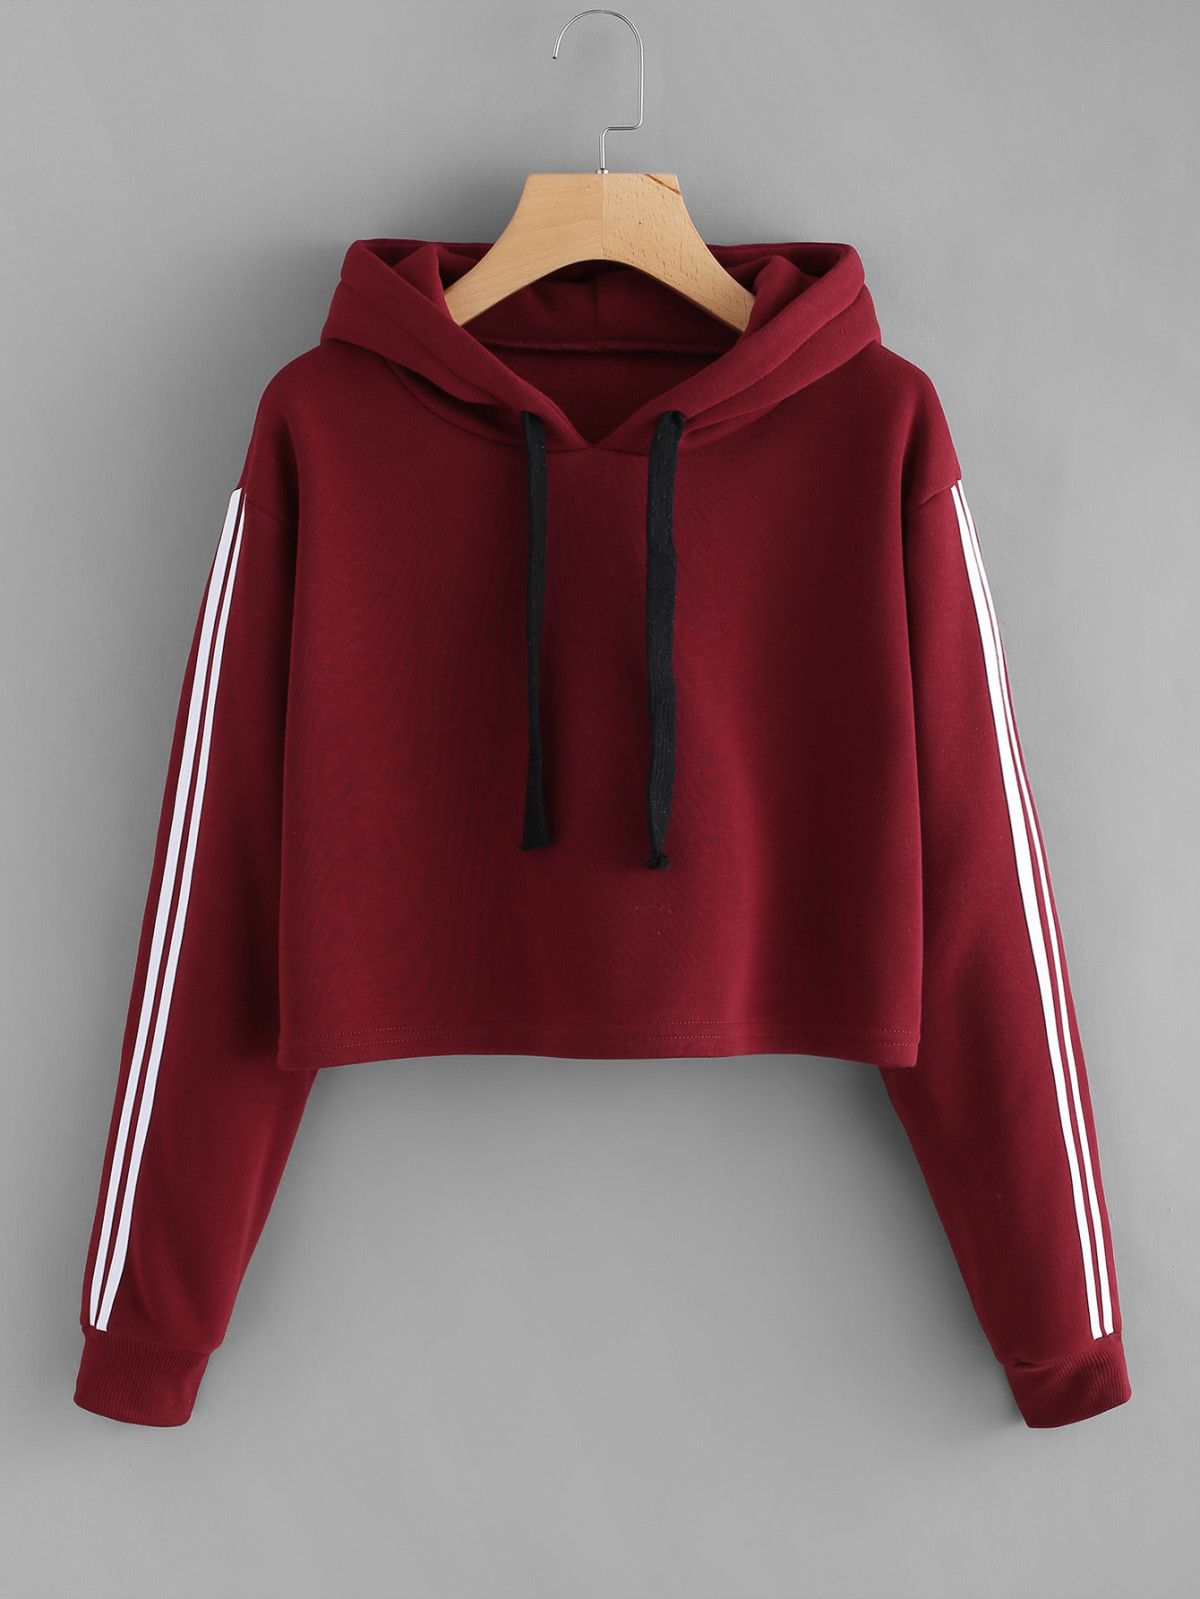 7a7801b56f8 Striped Sleeve Crop Hoodie in 2019 | Clothes | Cropped hoodie